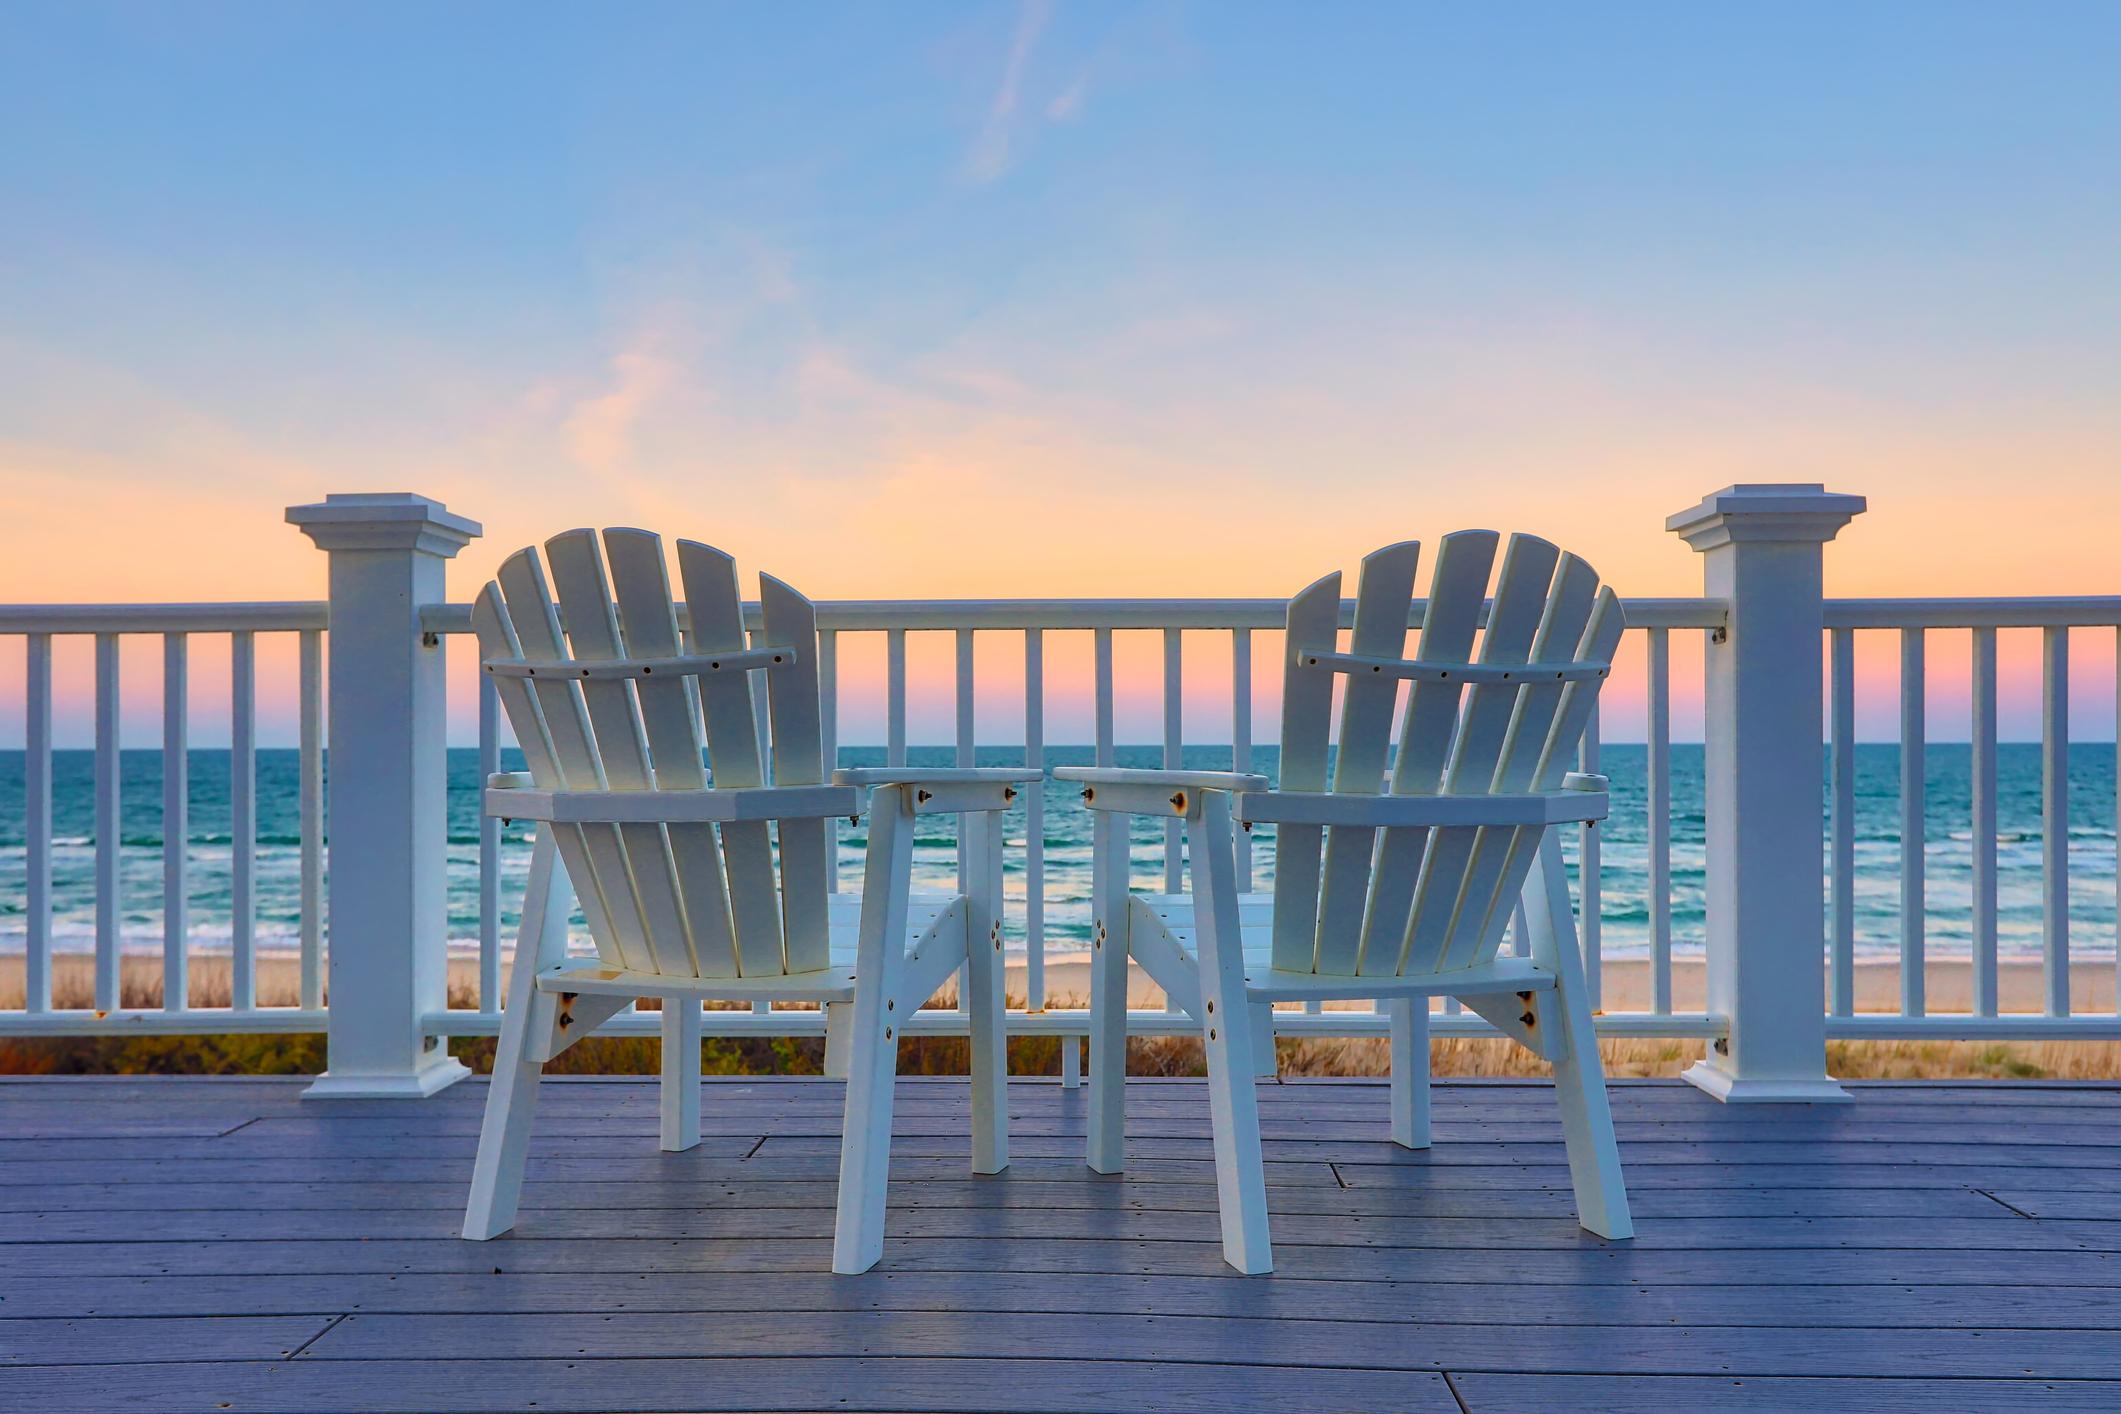 Adirondack Chairs Overlooking the Ocean